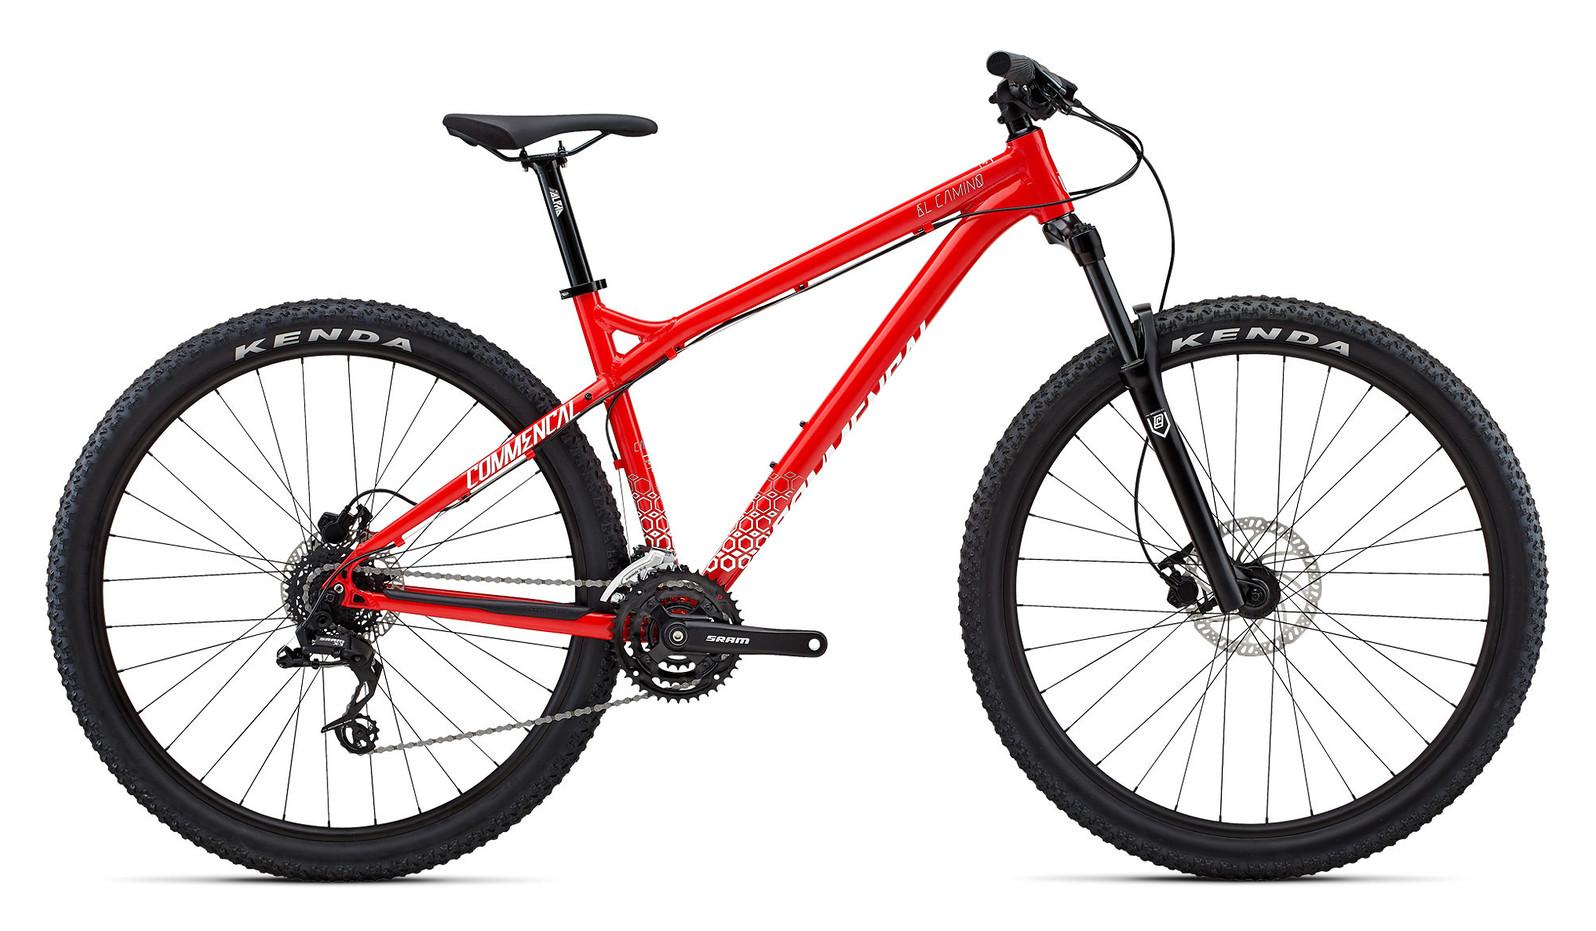 2018 Commencal El Camino Red Bike